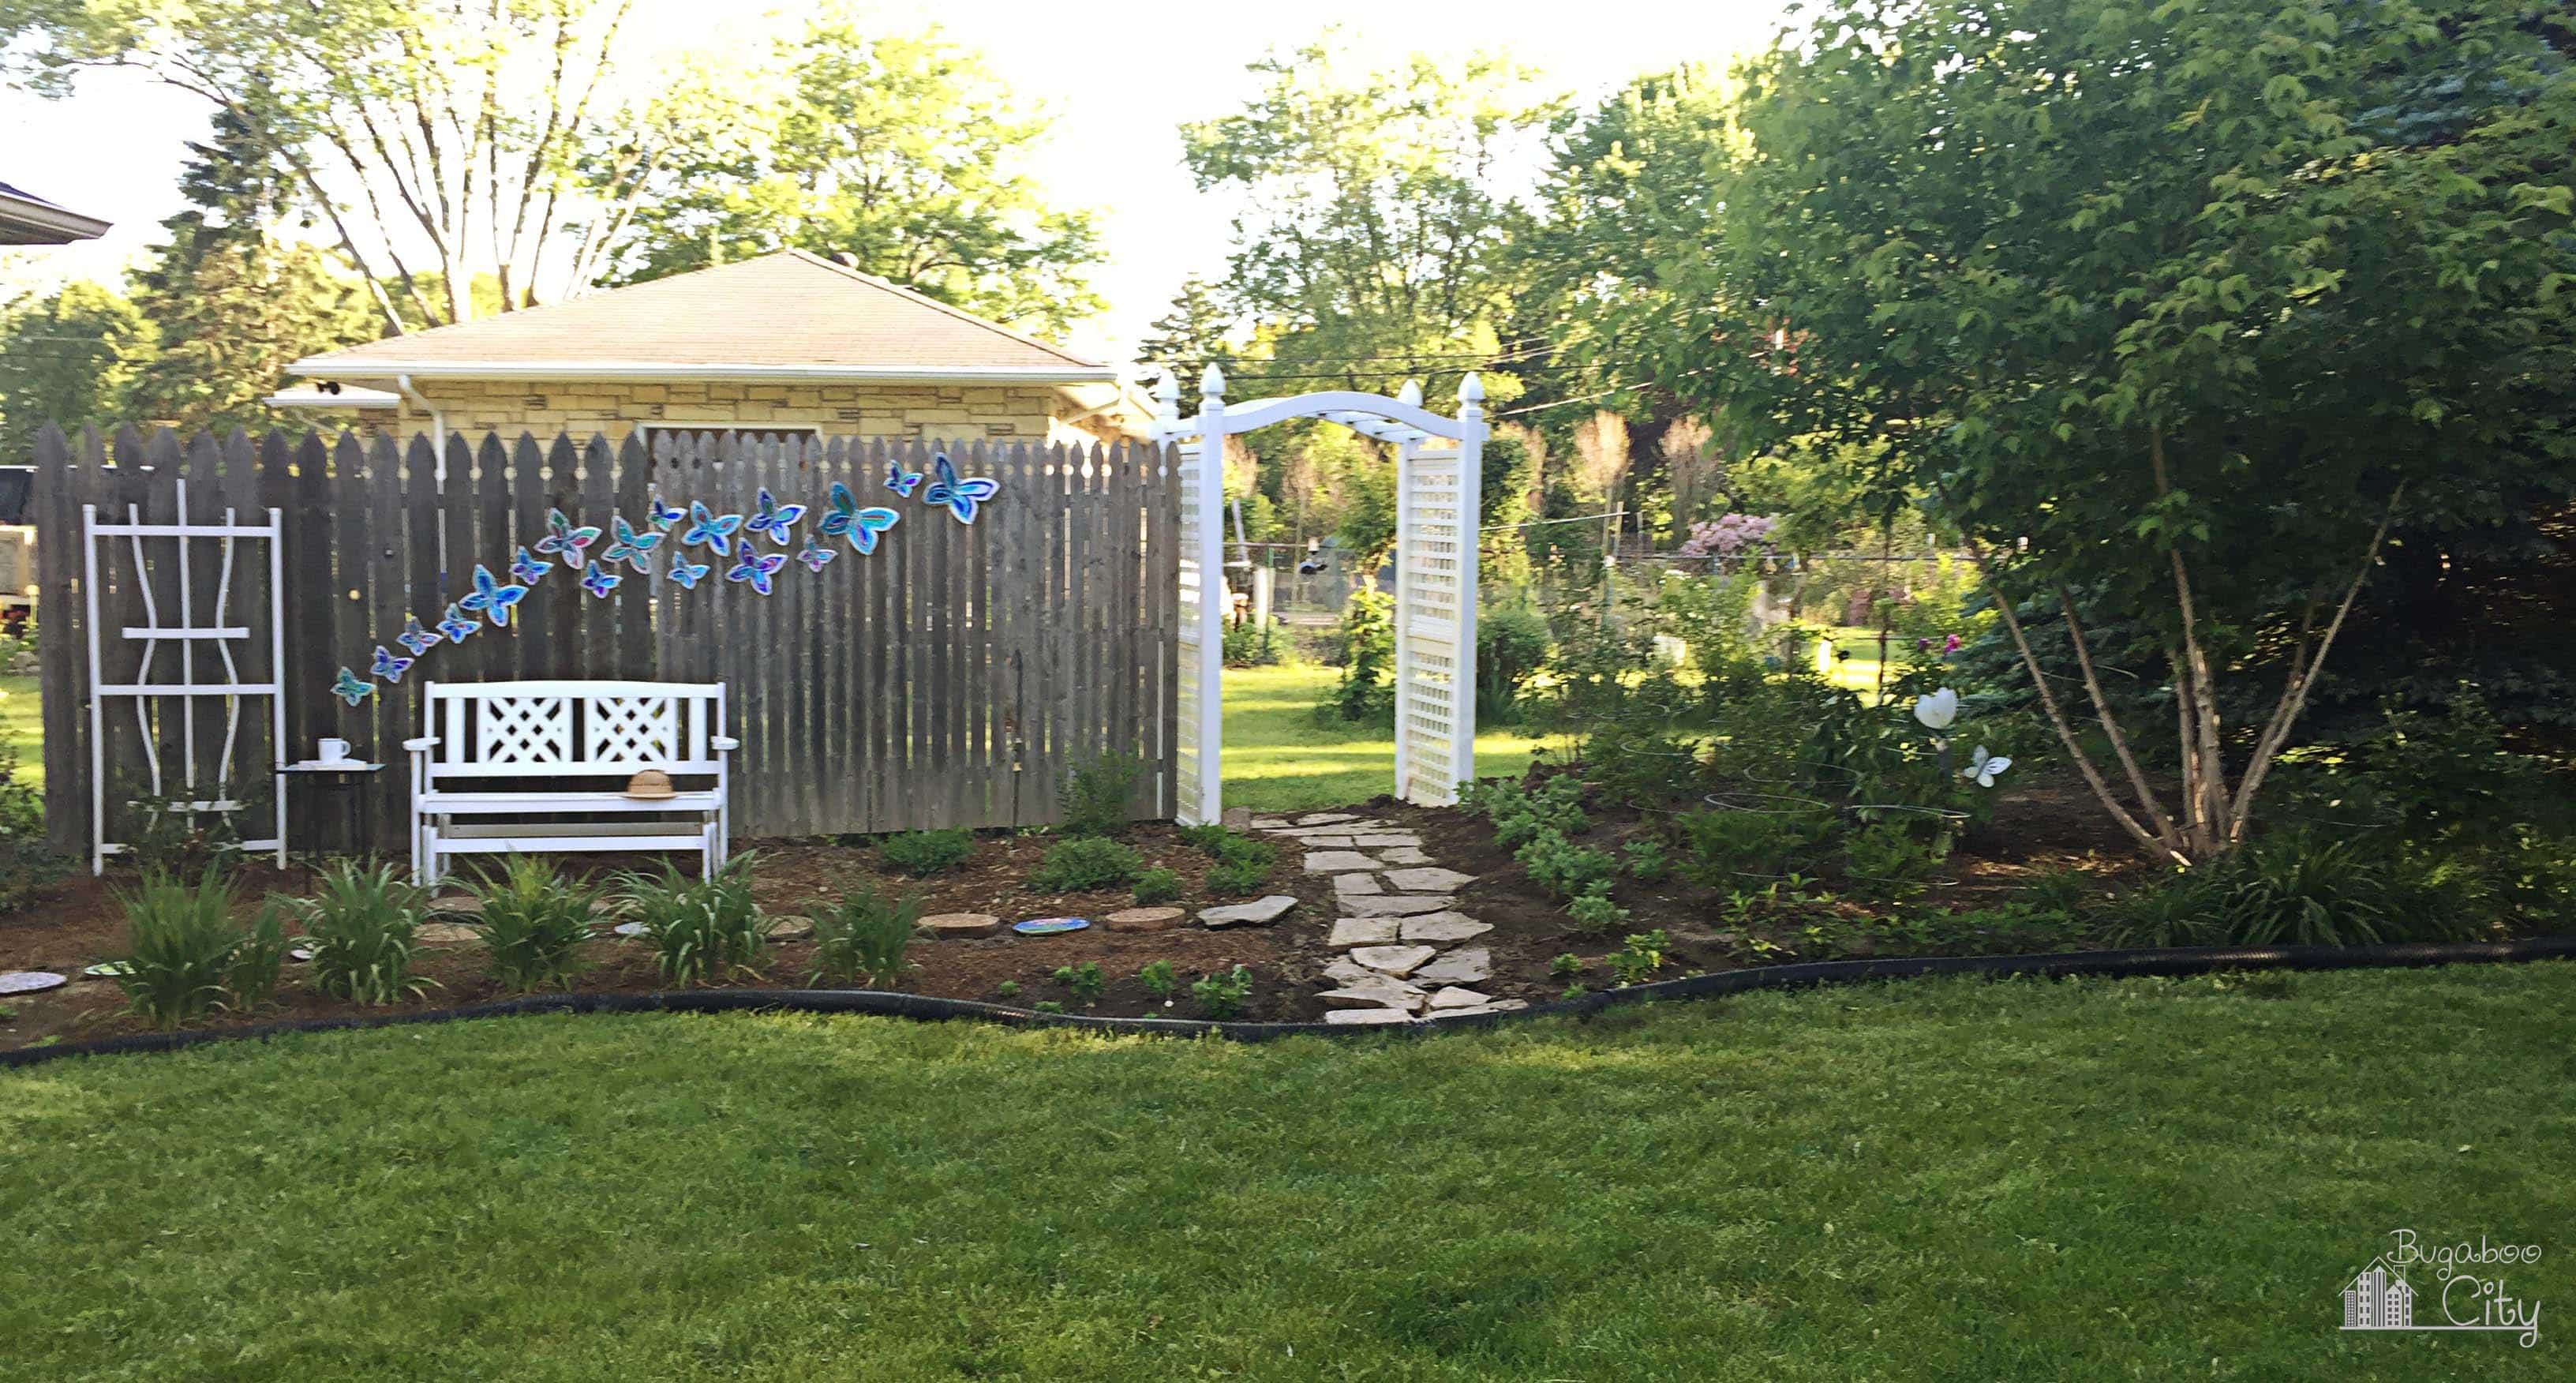 Diy Butterfly Garden Ornament Bugaboocity Fence 16 2 New Lawn Tutorial